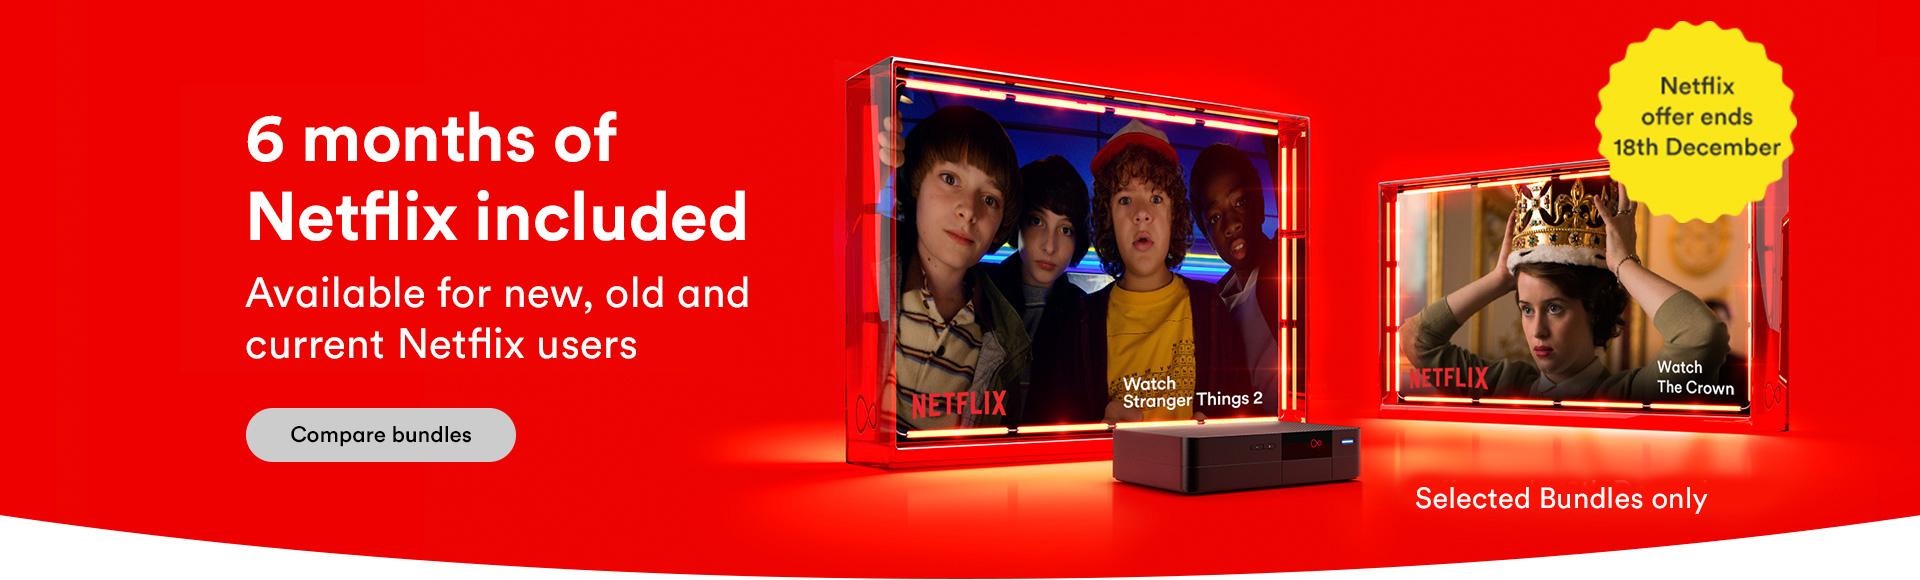 Virgin Media Retention Deal  £40.00 / month 200Mbps / Full House TV / Weekend Calls / Super Hub 3 upgrade / V6 Box